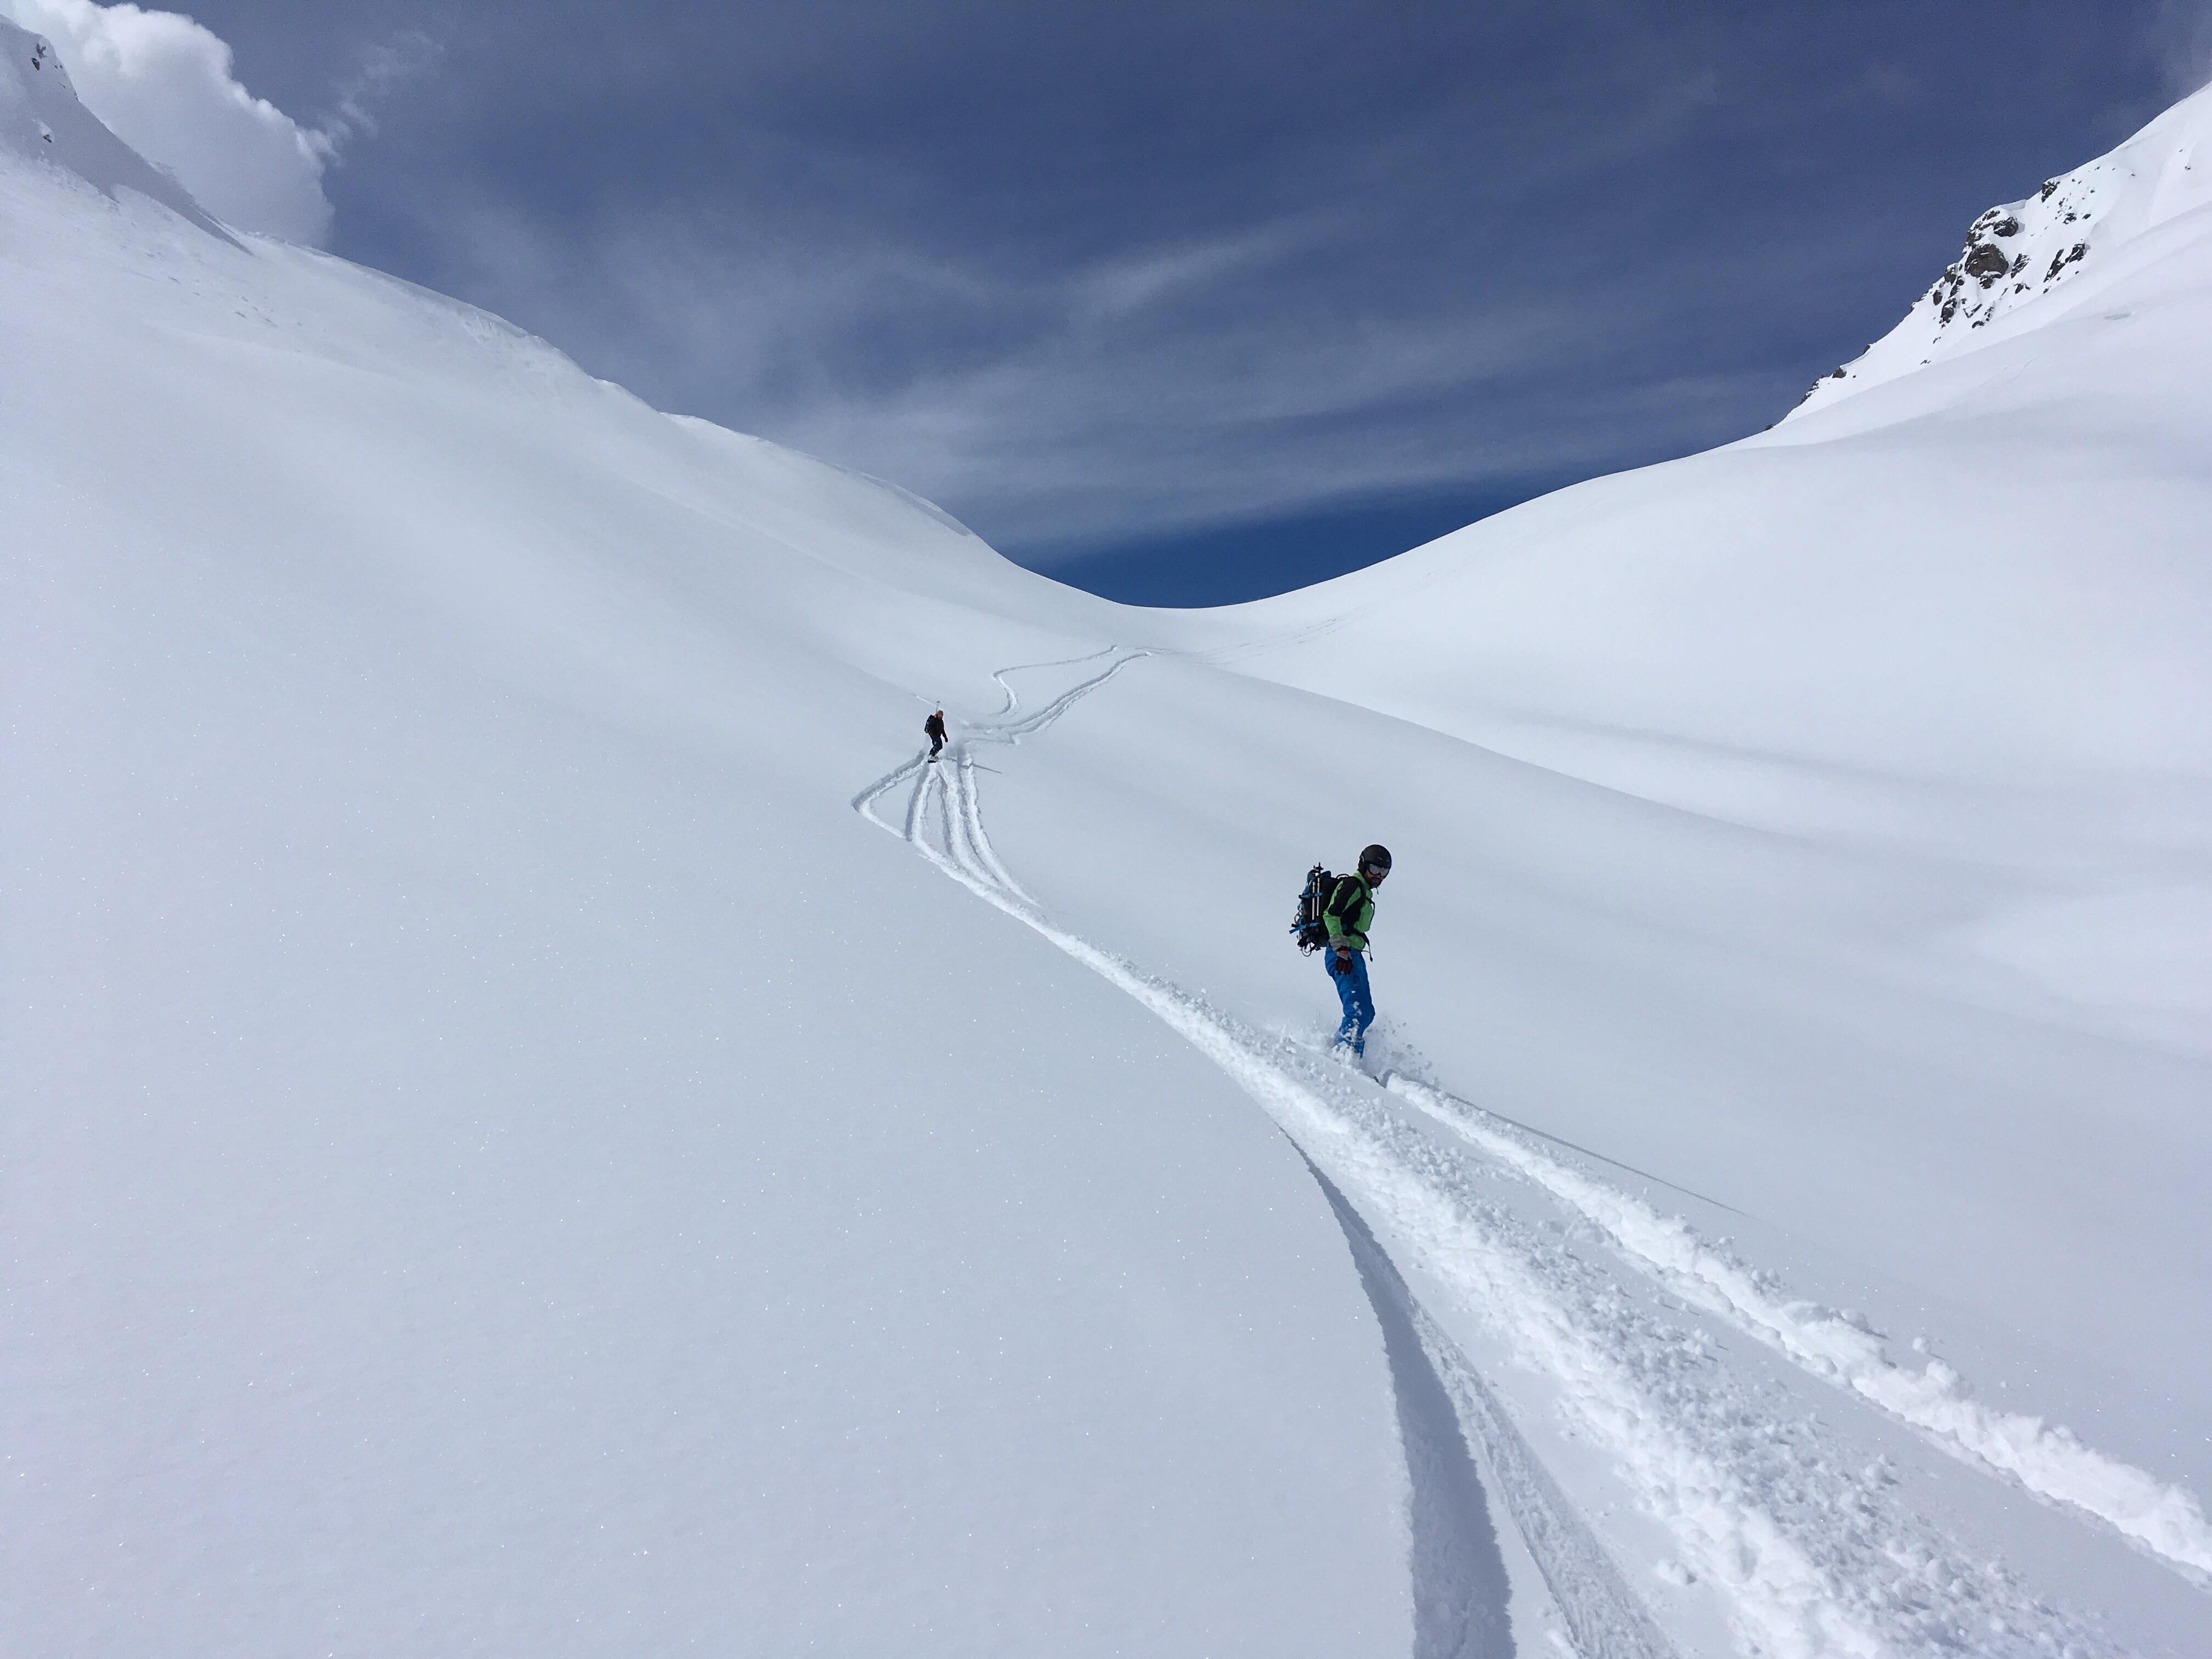 Col de la Louze snowboard 1